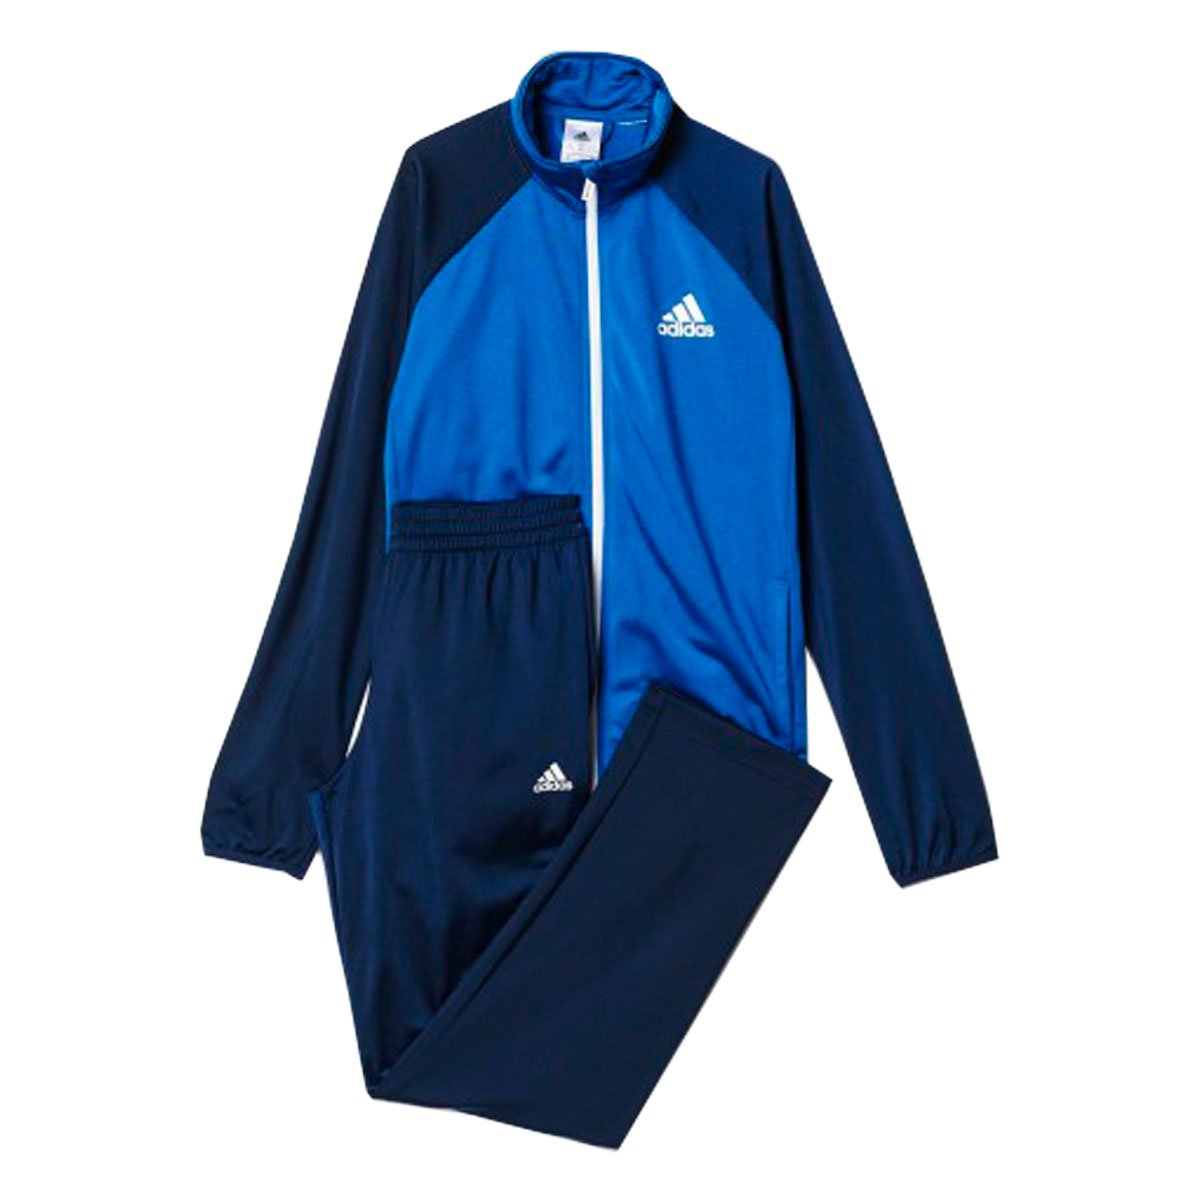 8481c25a8bb Bizz Store - Agasalho Infantil Juvenil Adidas YB TS Entry Oh